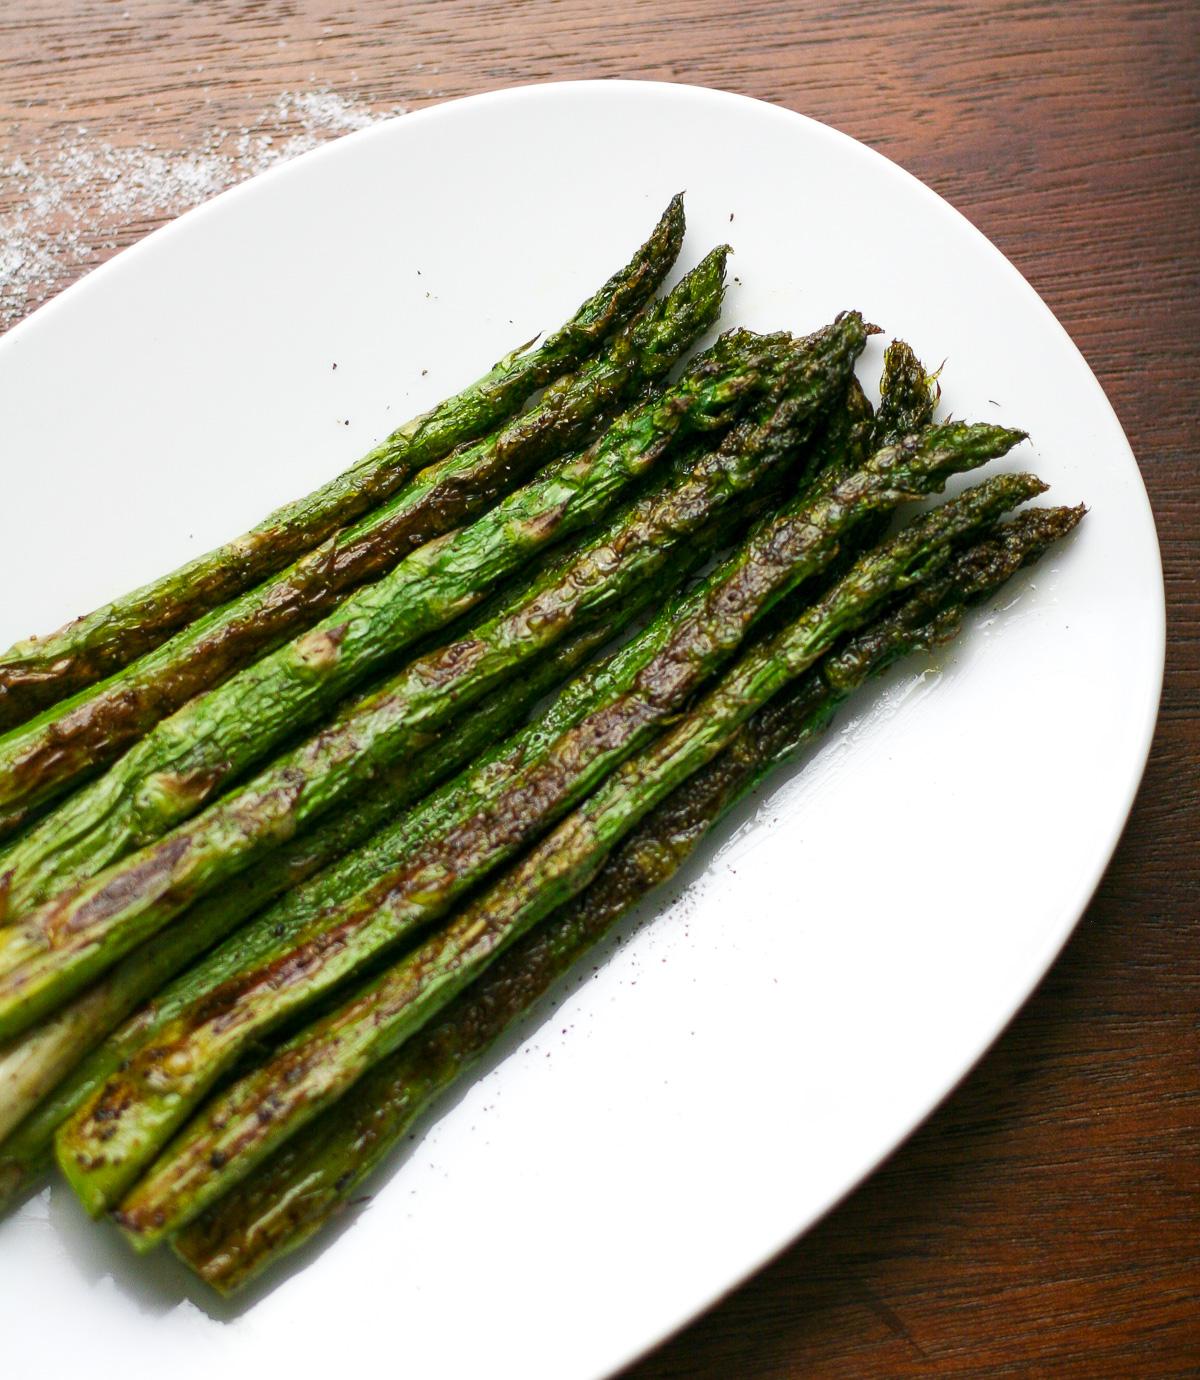 Oven Roasted Asparagus - Erica Julson